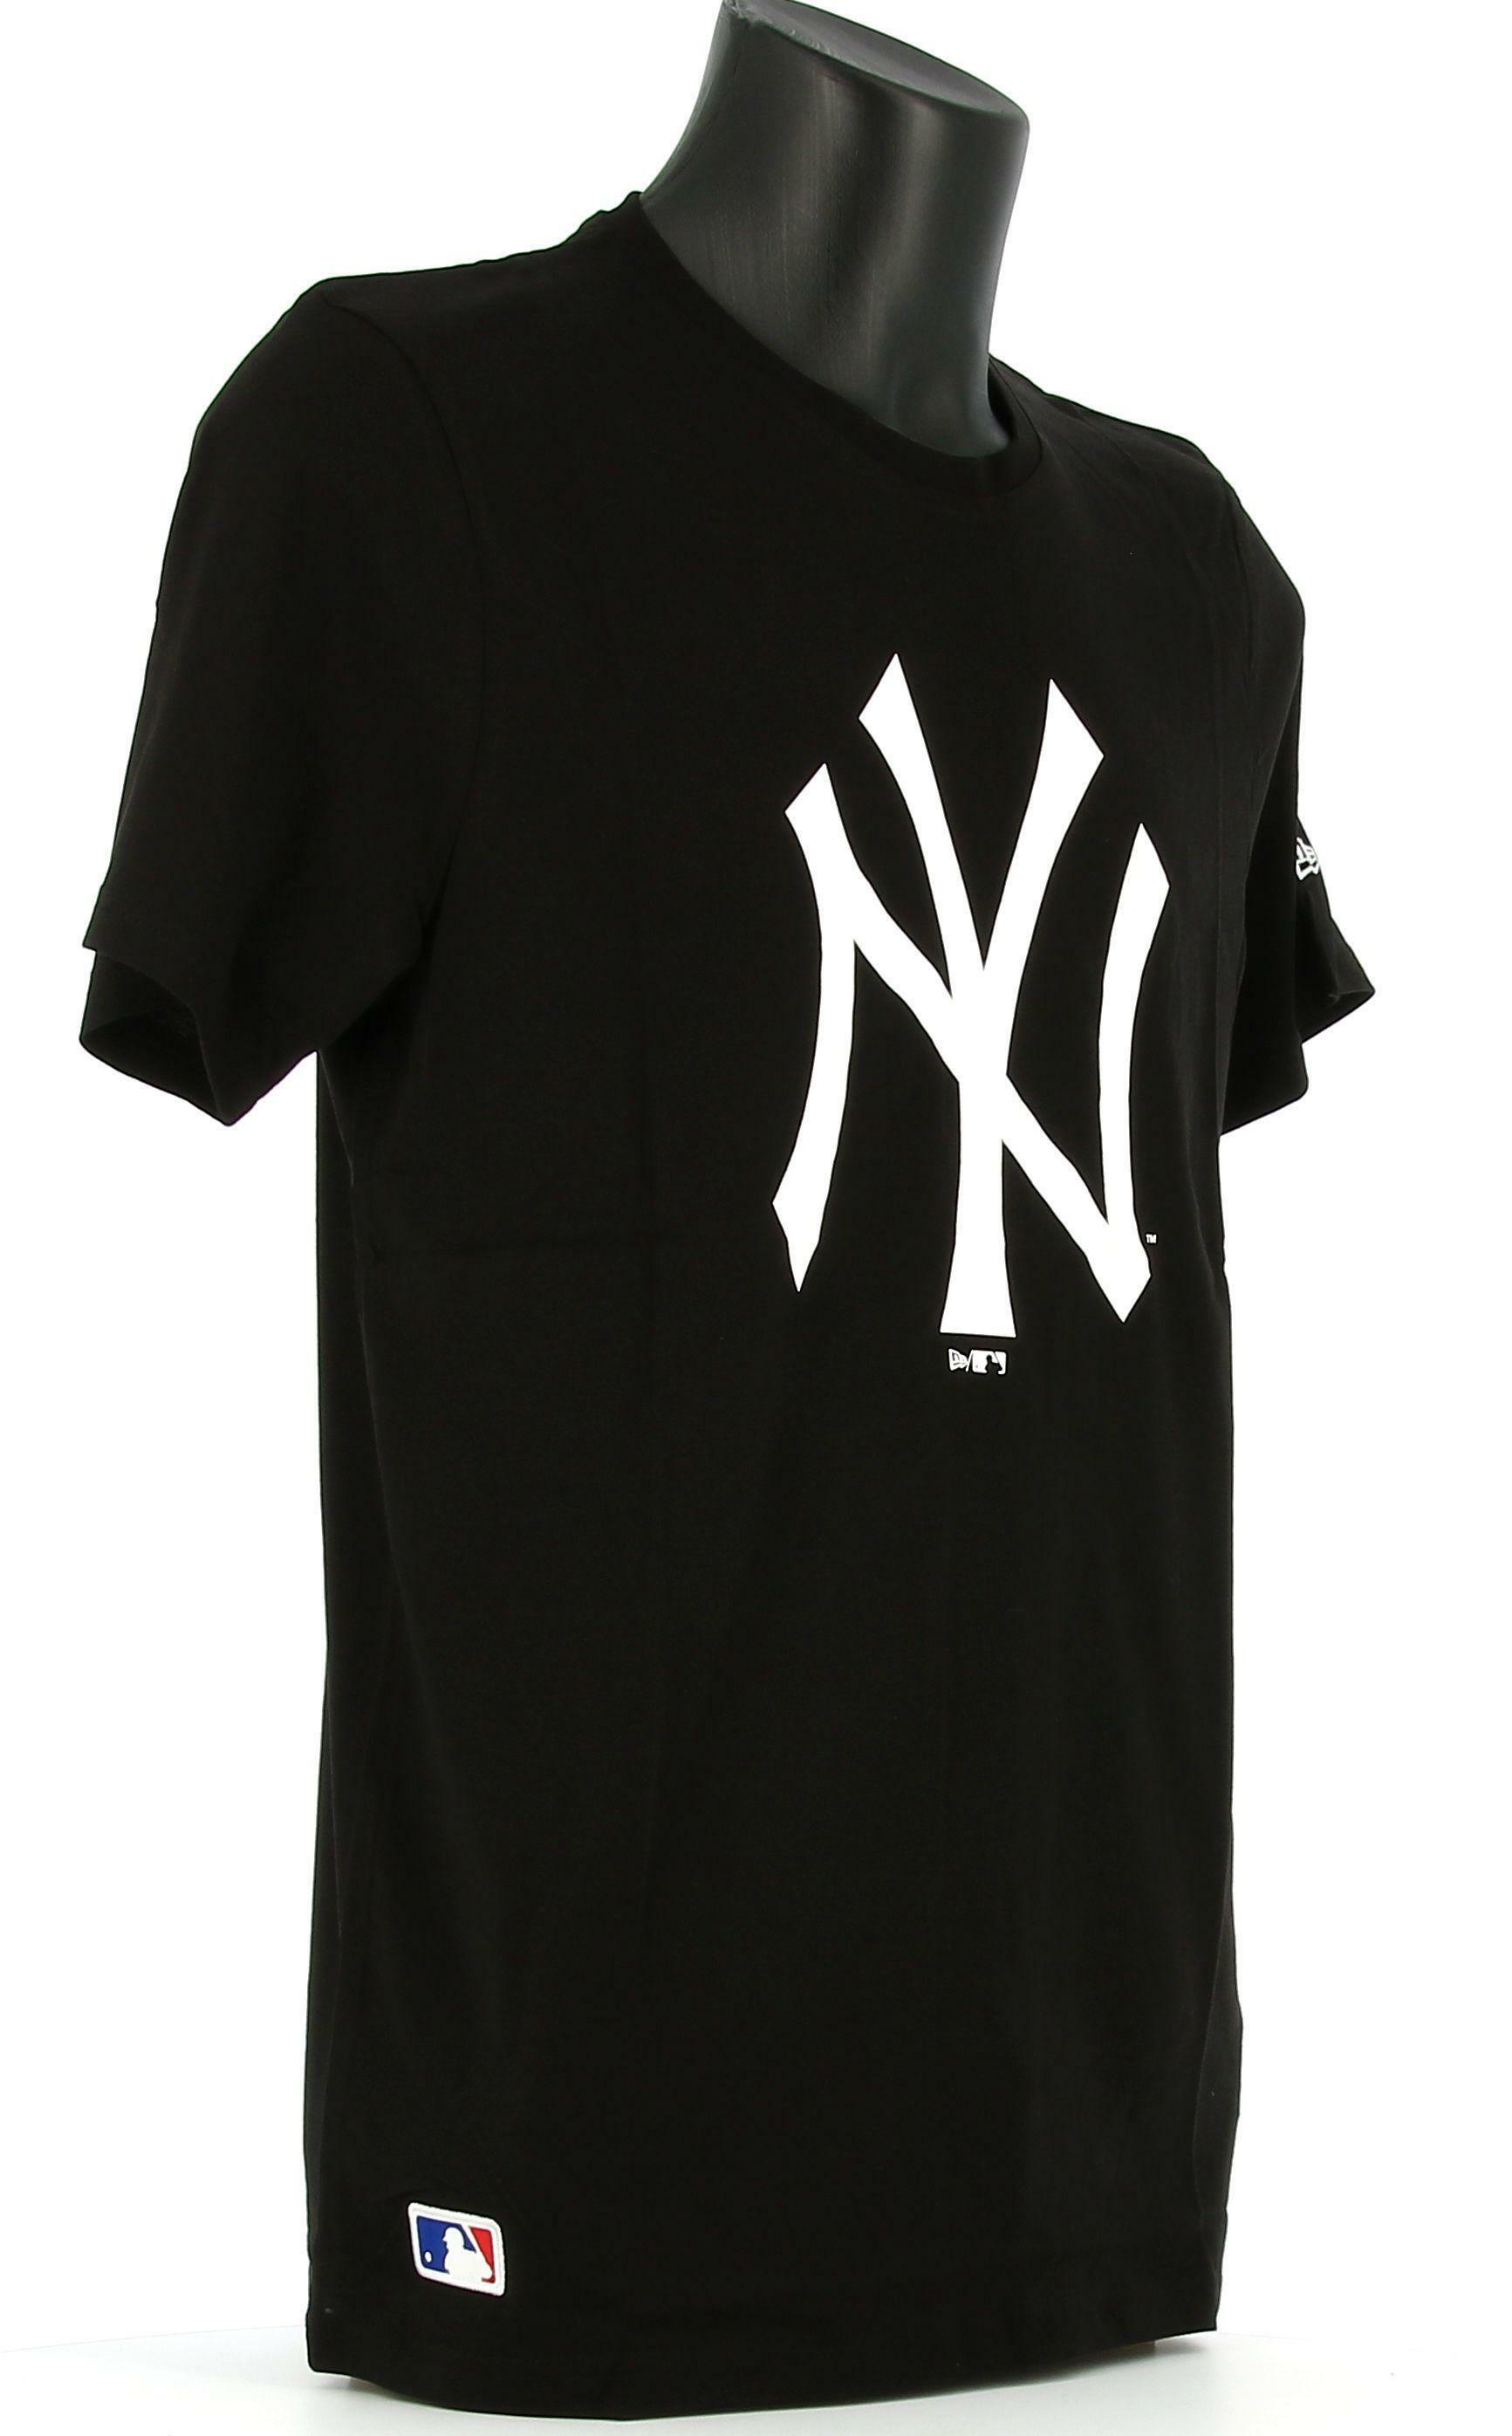 new era new era t-shirt uomo 11863697 black